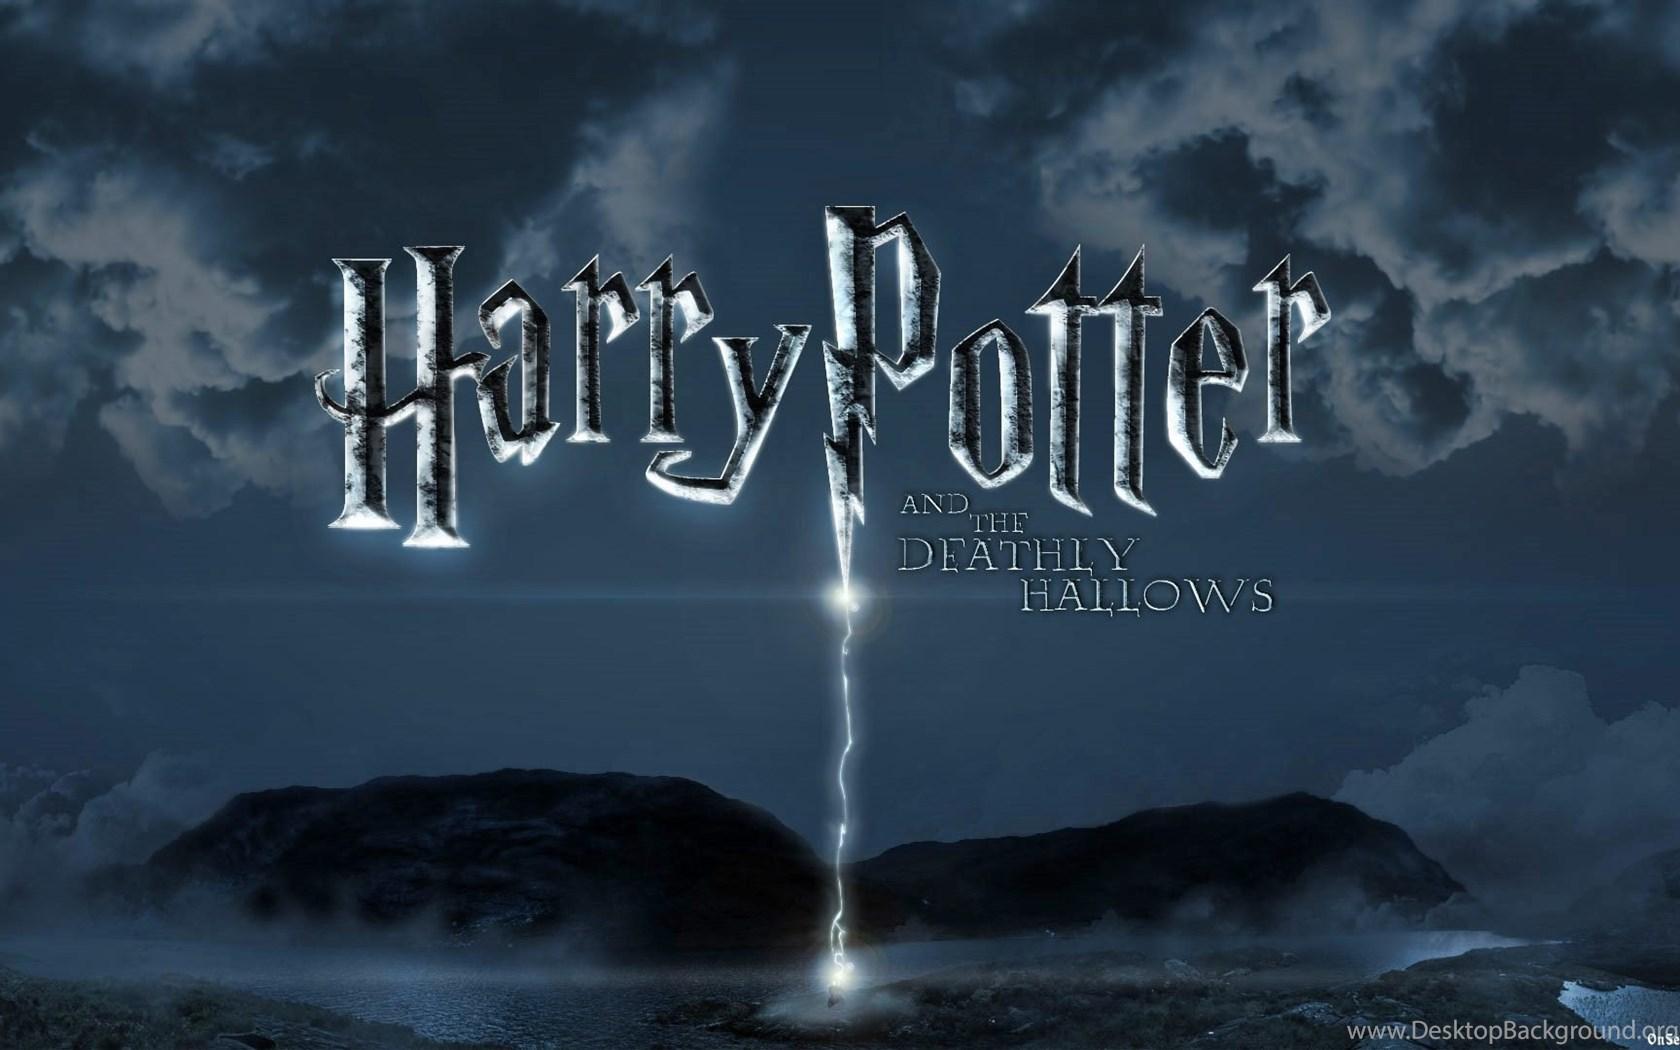 Harry Potter Deathly Hallows Wallpapers Wallpapers Desktop Background